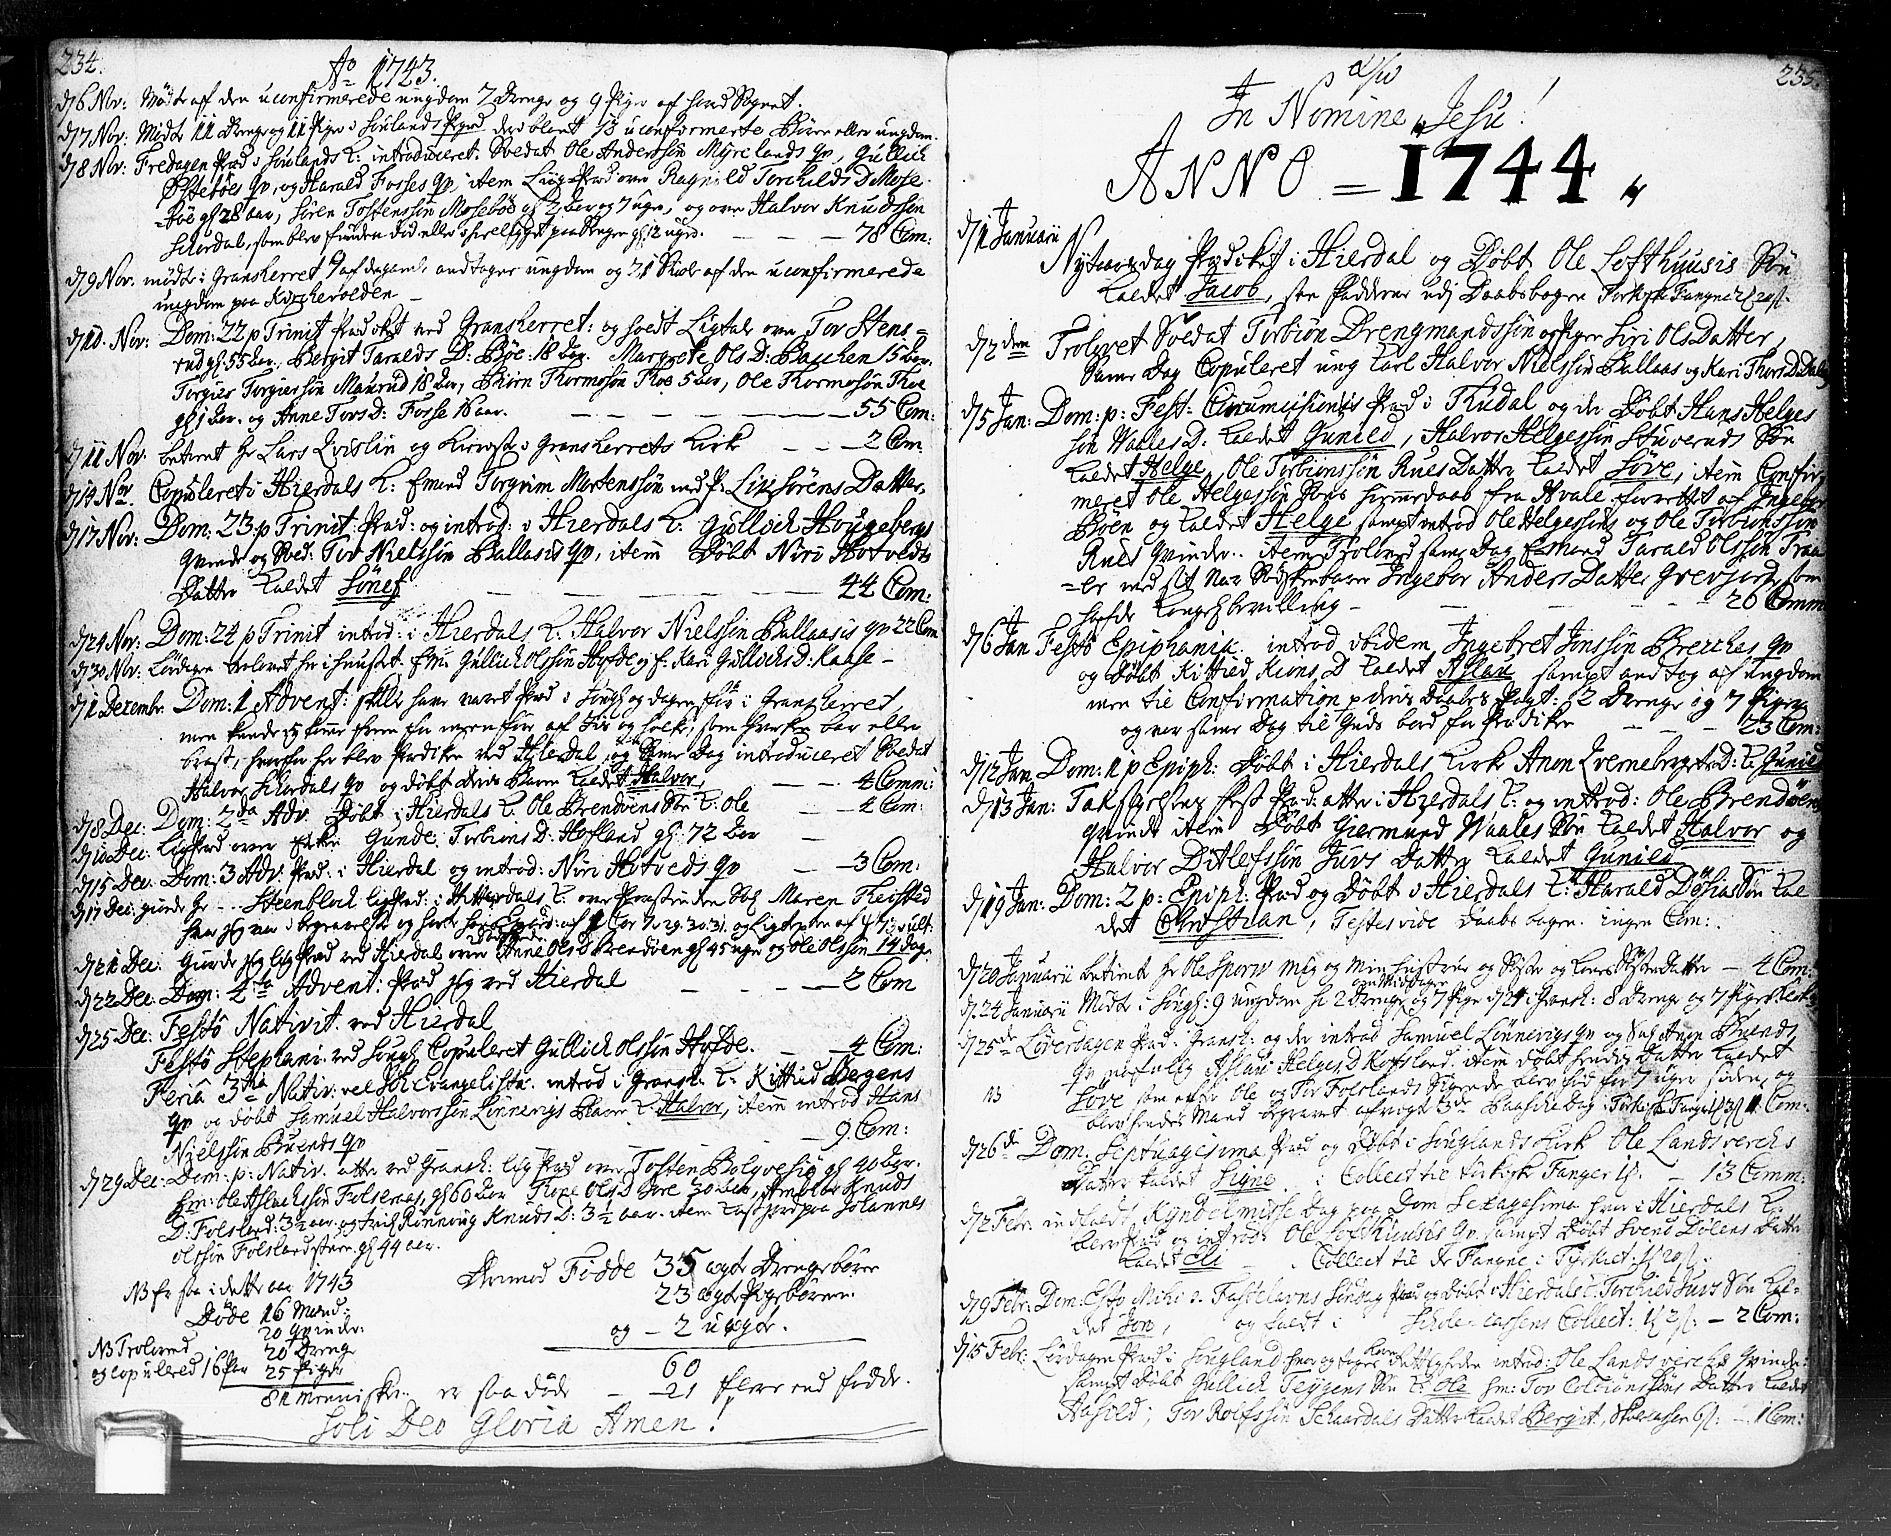 SAKO, Hjartdal kirkebøker, F/Fa/L0002: Ministerialbok nr. I 2, 1716-1754, s. 234-235